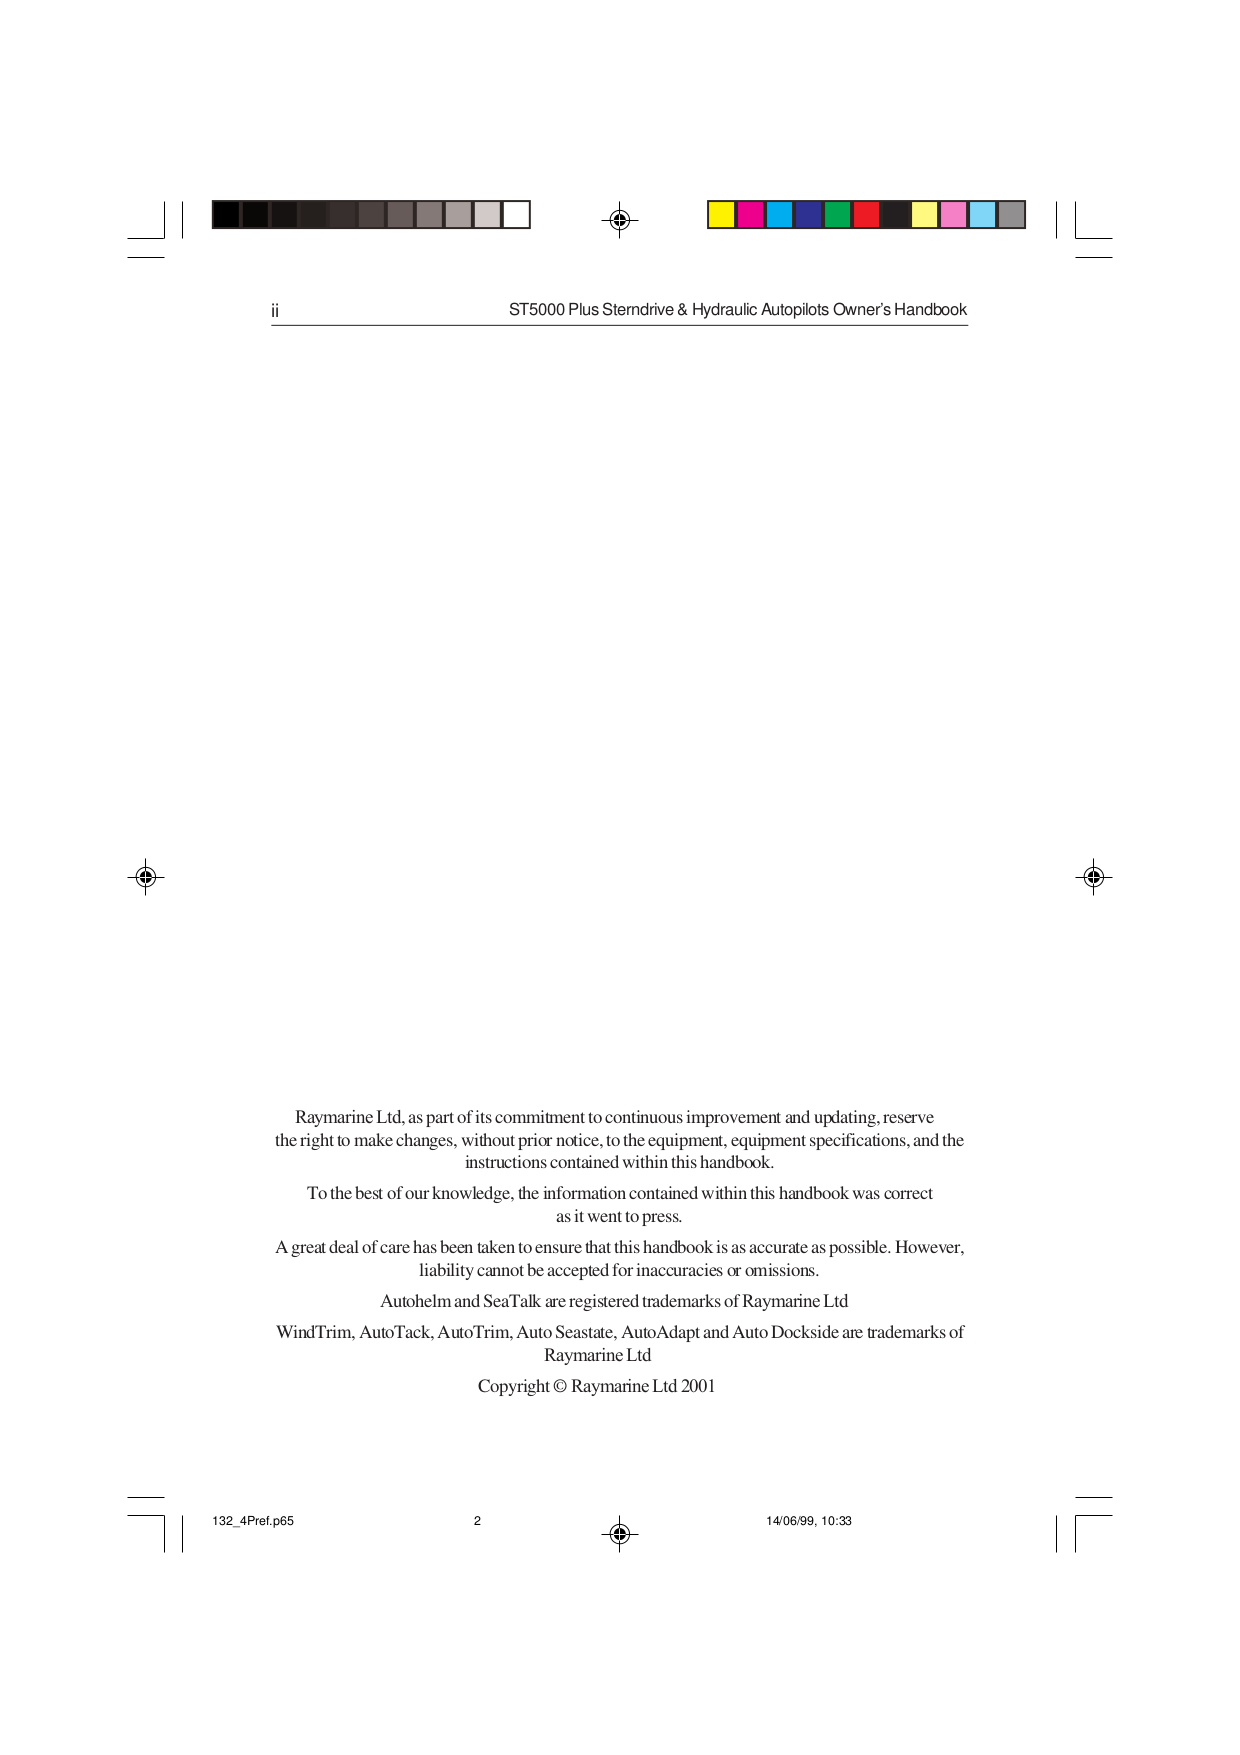 pdf manual for raymarine gps autohelm st5000 raymarine autopilot st5000+ manual raymarine st5000 plus manual